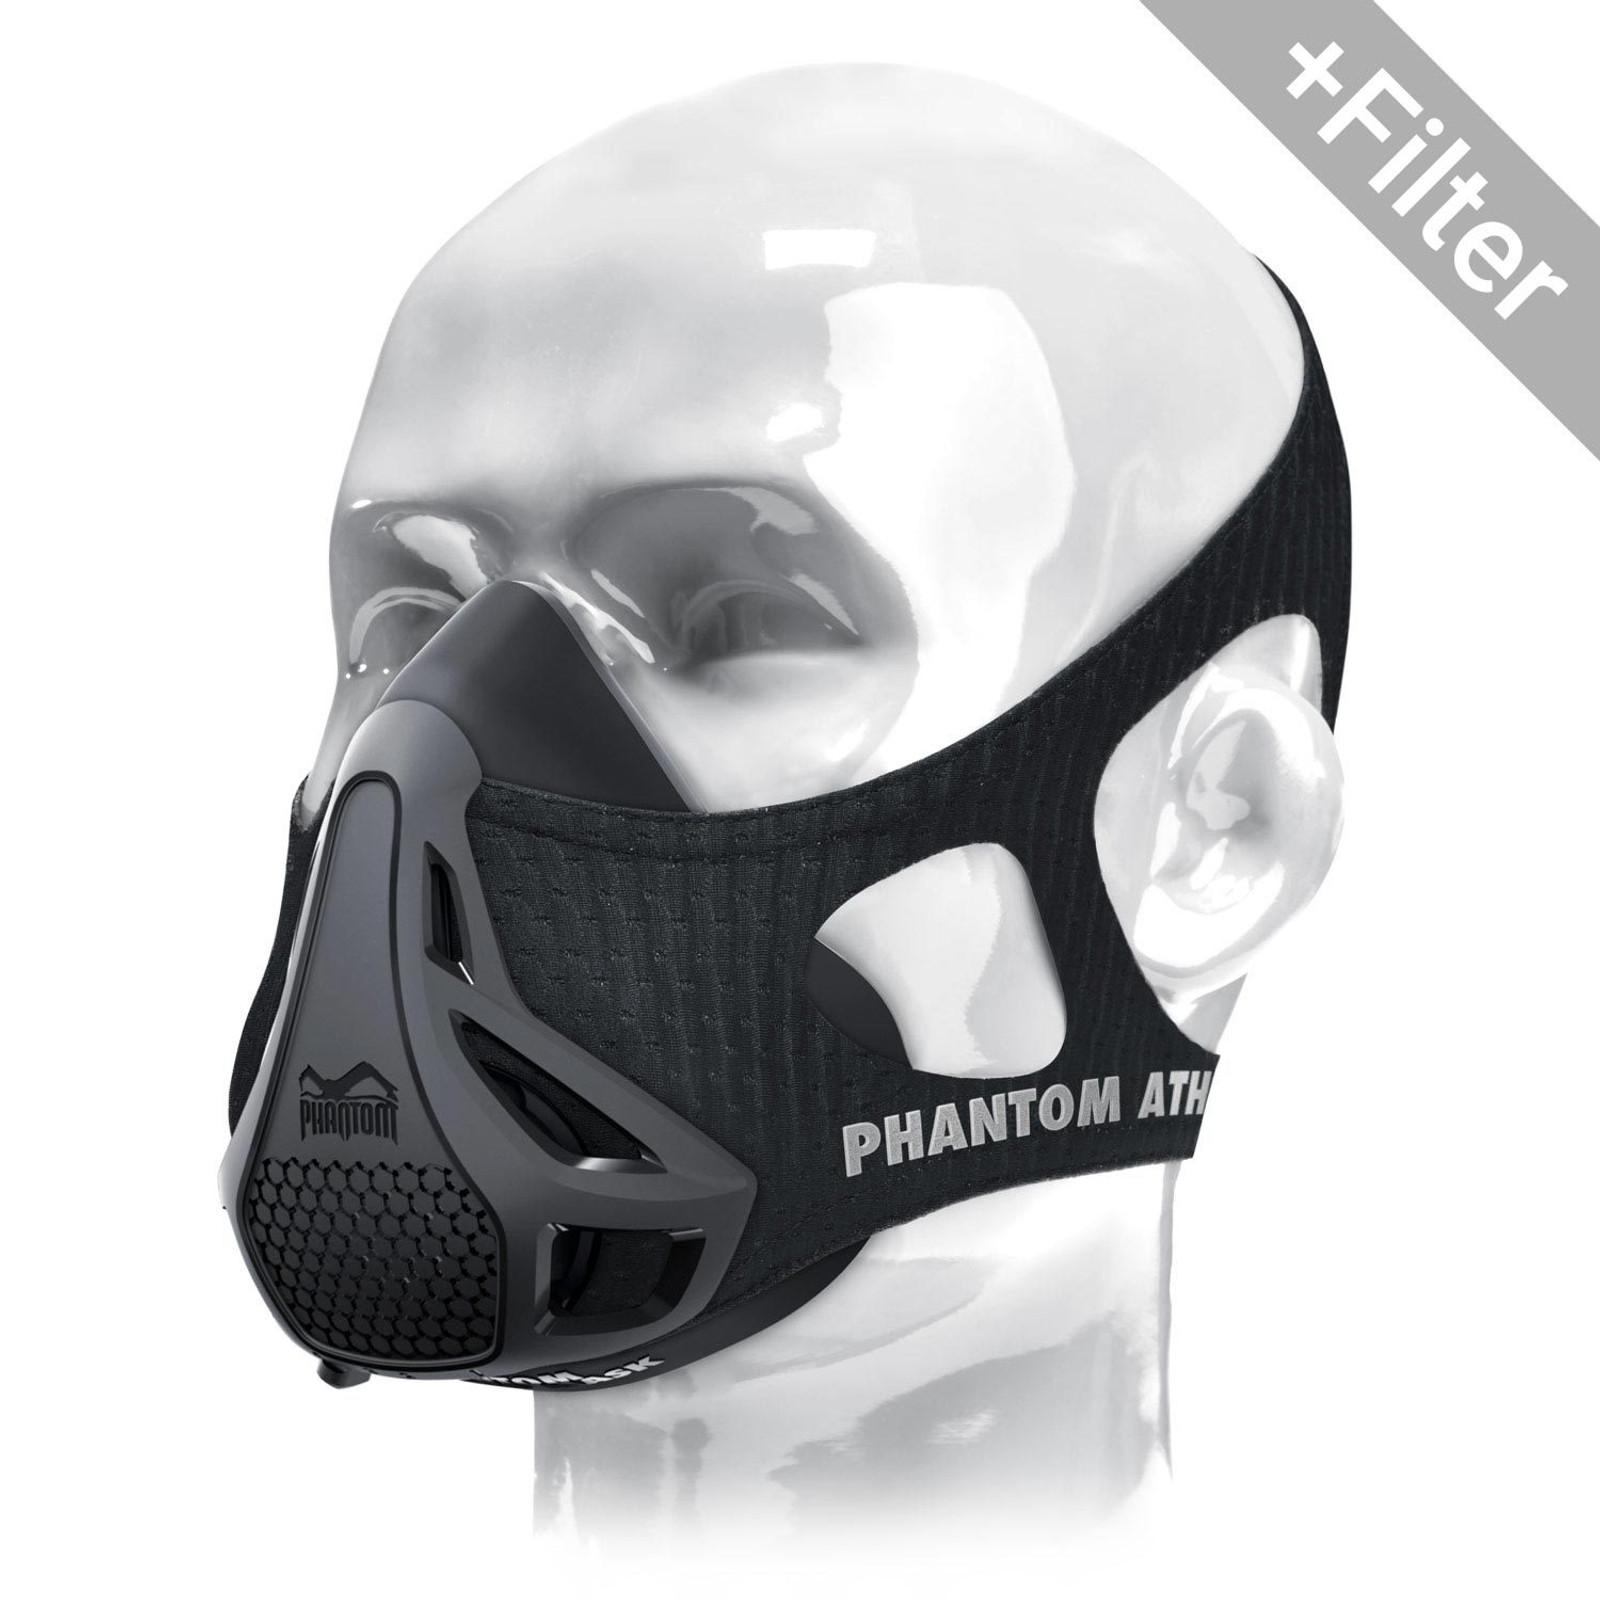 [Paket] Phantom Athletics Trainingsmaske mit GKD Filter